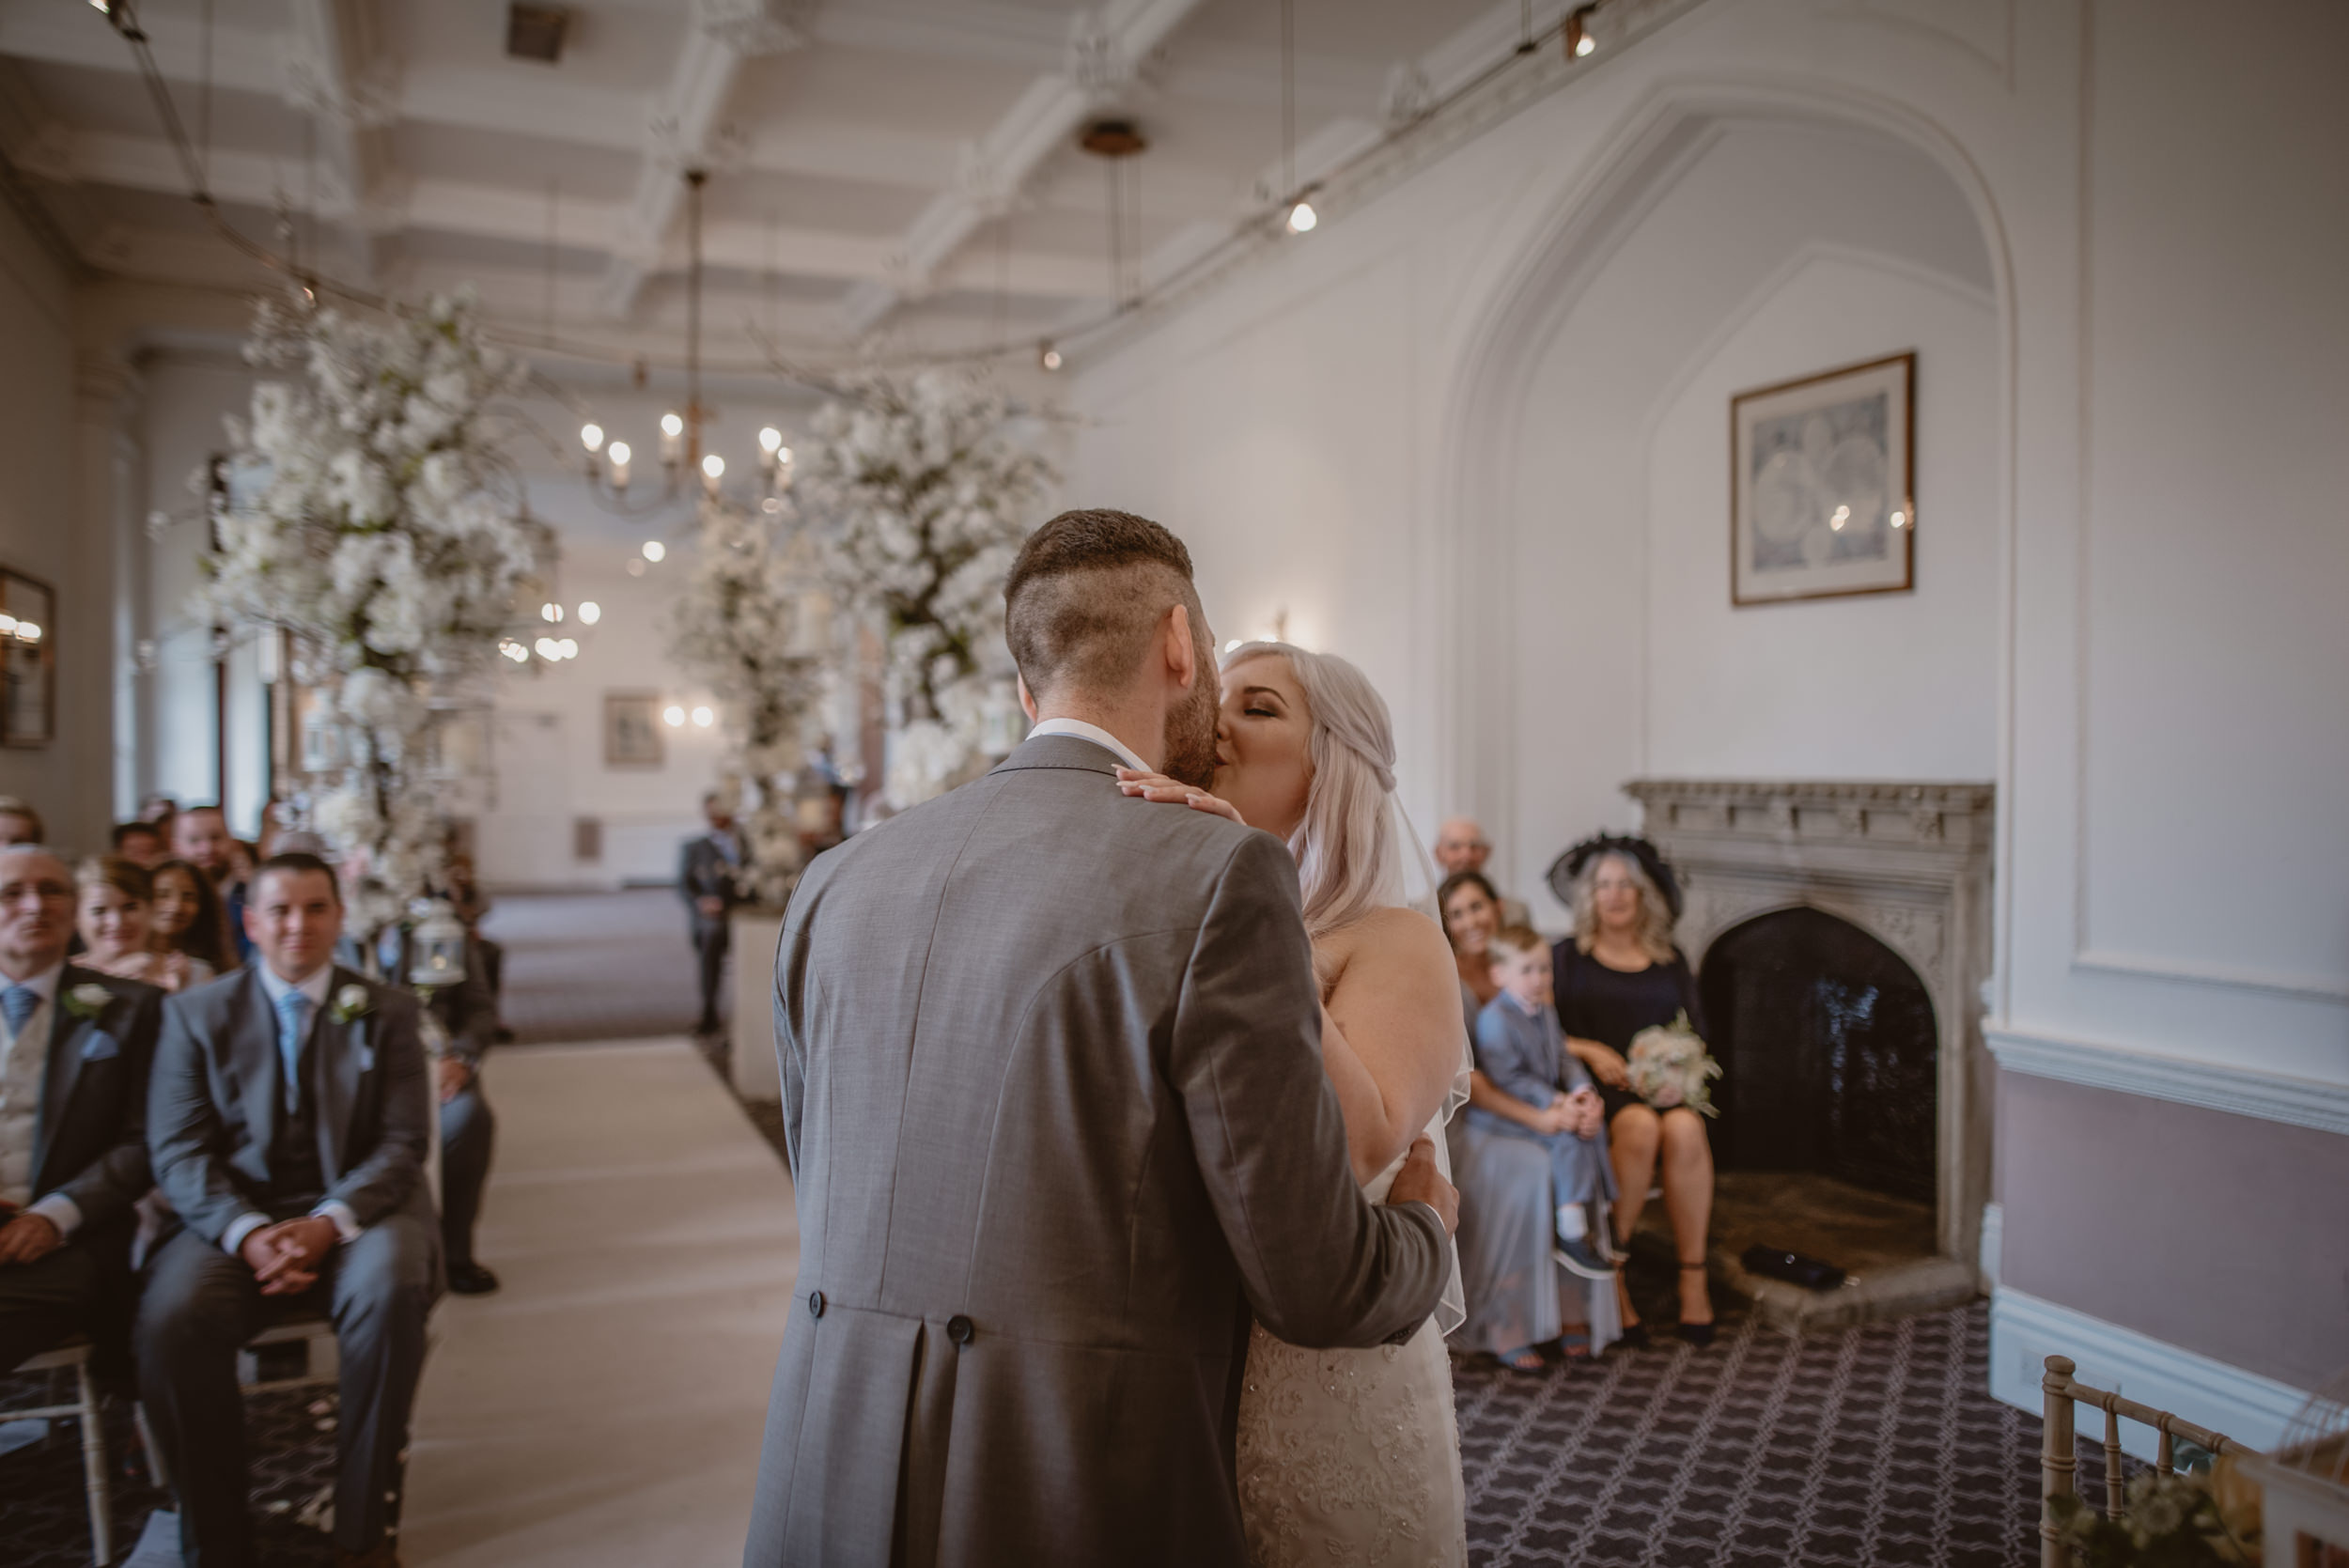 Rachel-and-James-Wedding-Horsley-Towers-State-Manu-Mendoza-Wedding-Photography-277.jpg